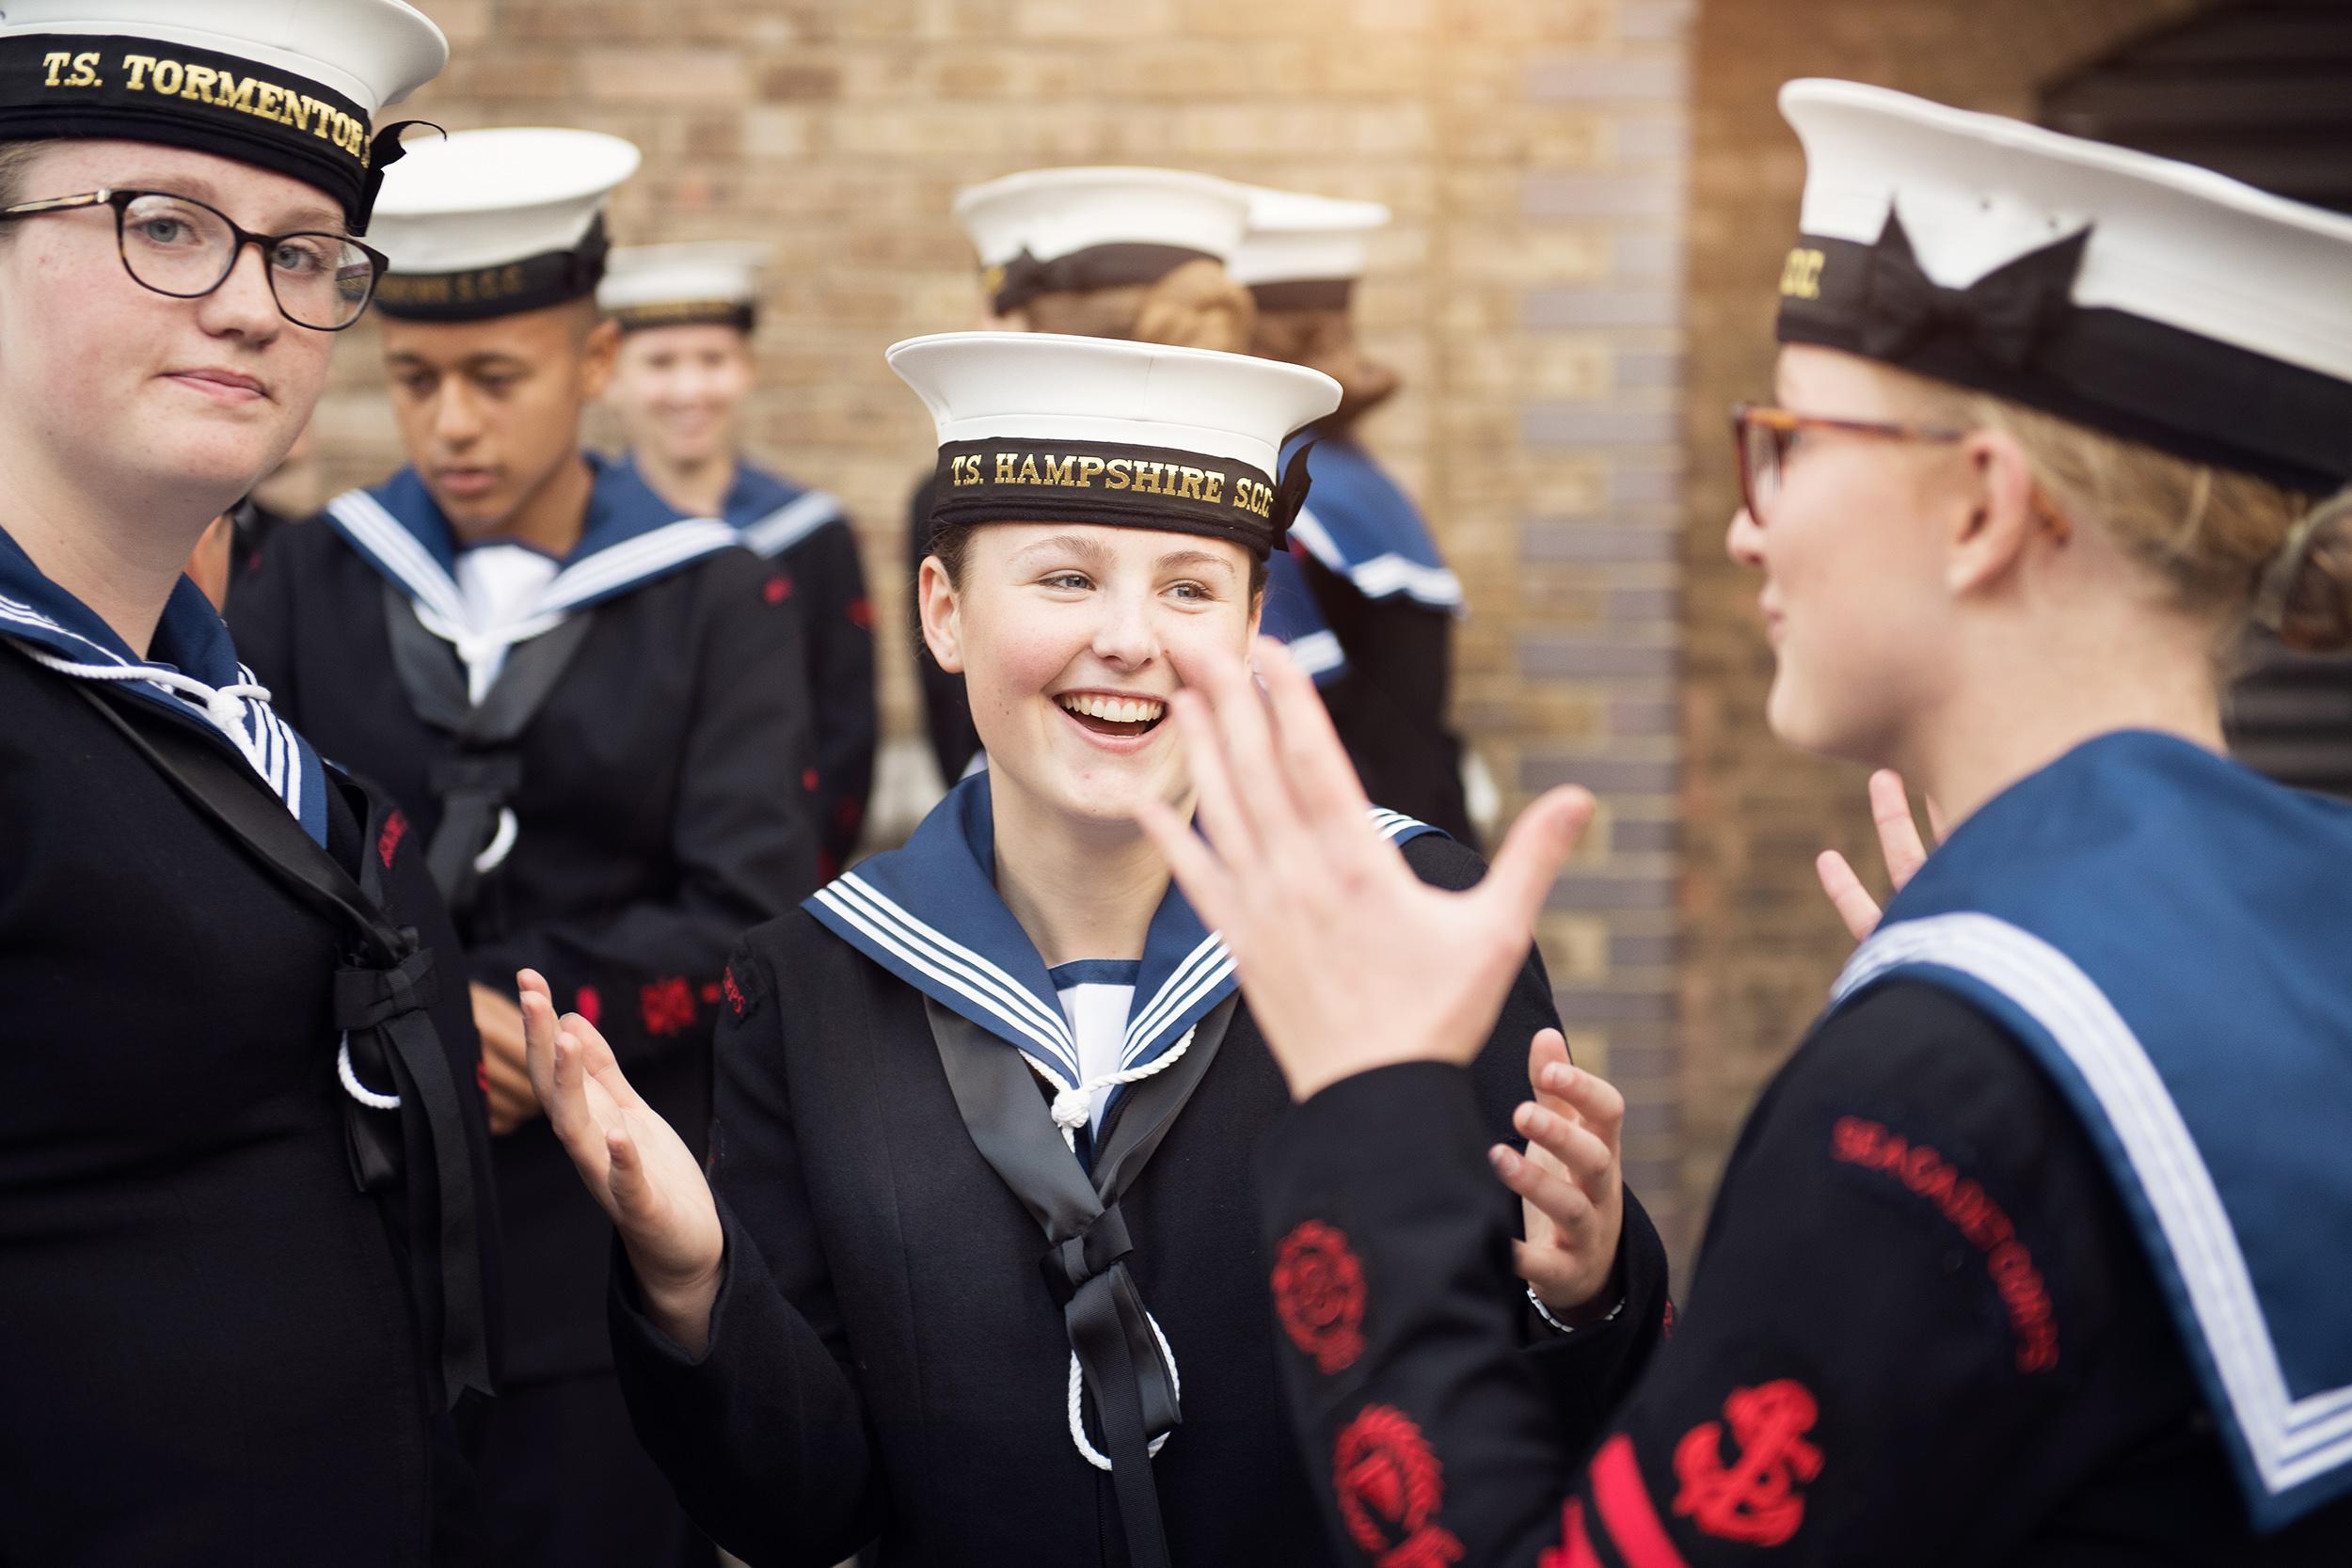 sea+cadets+ts+stellios+2018+quick+edit-4.jpg